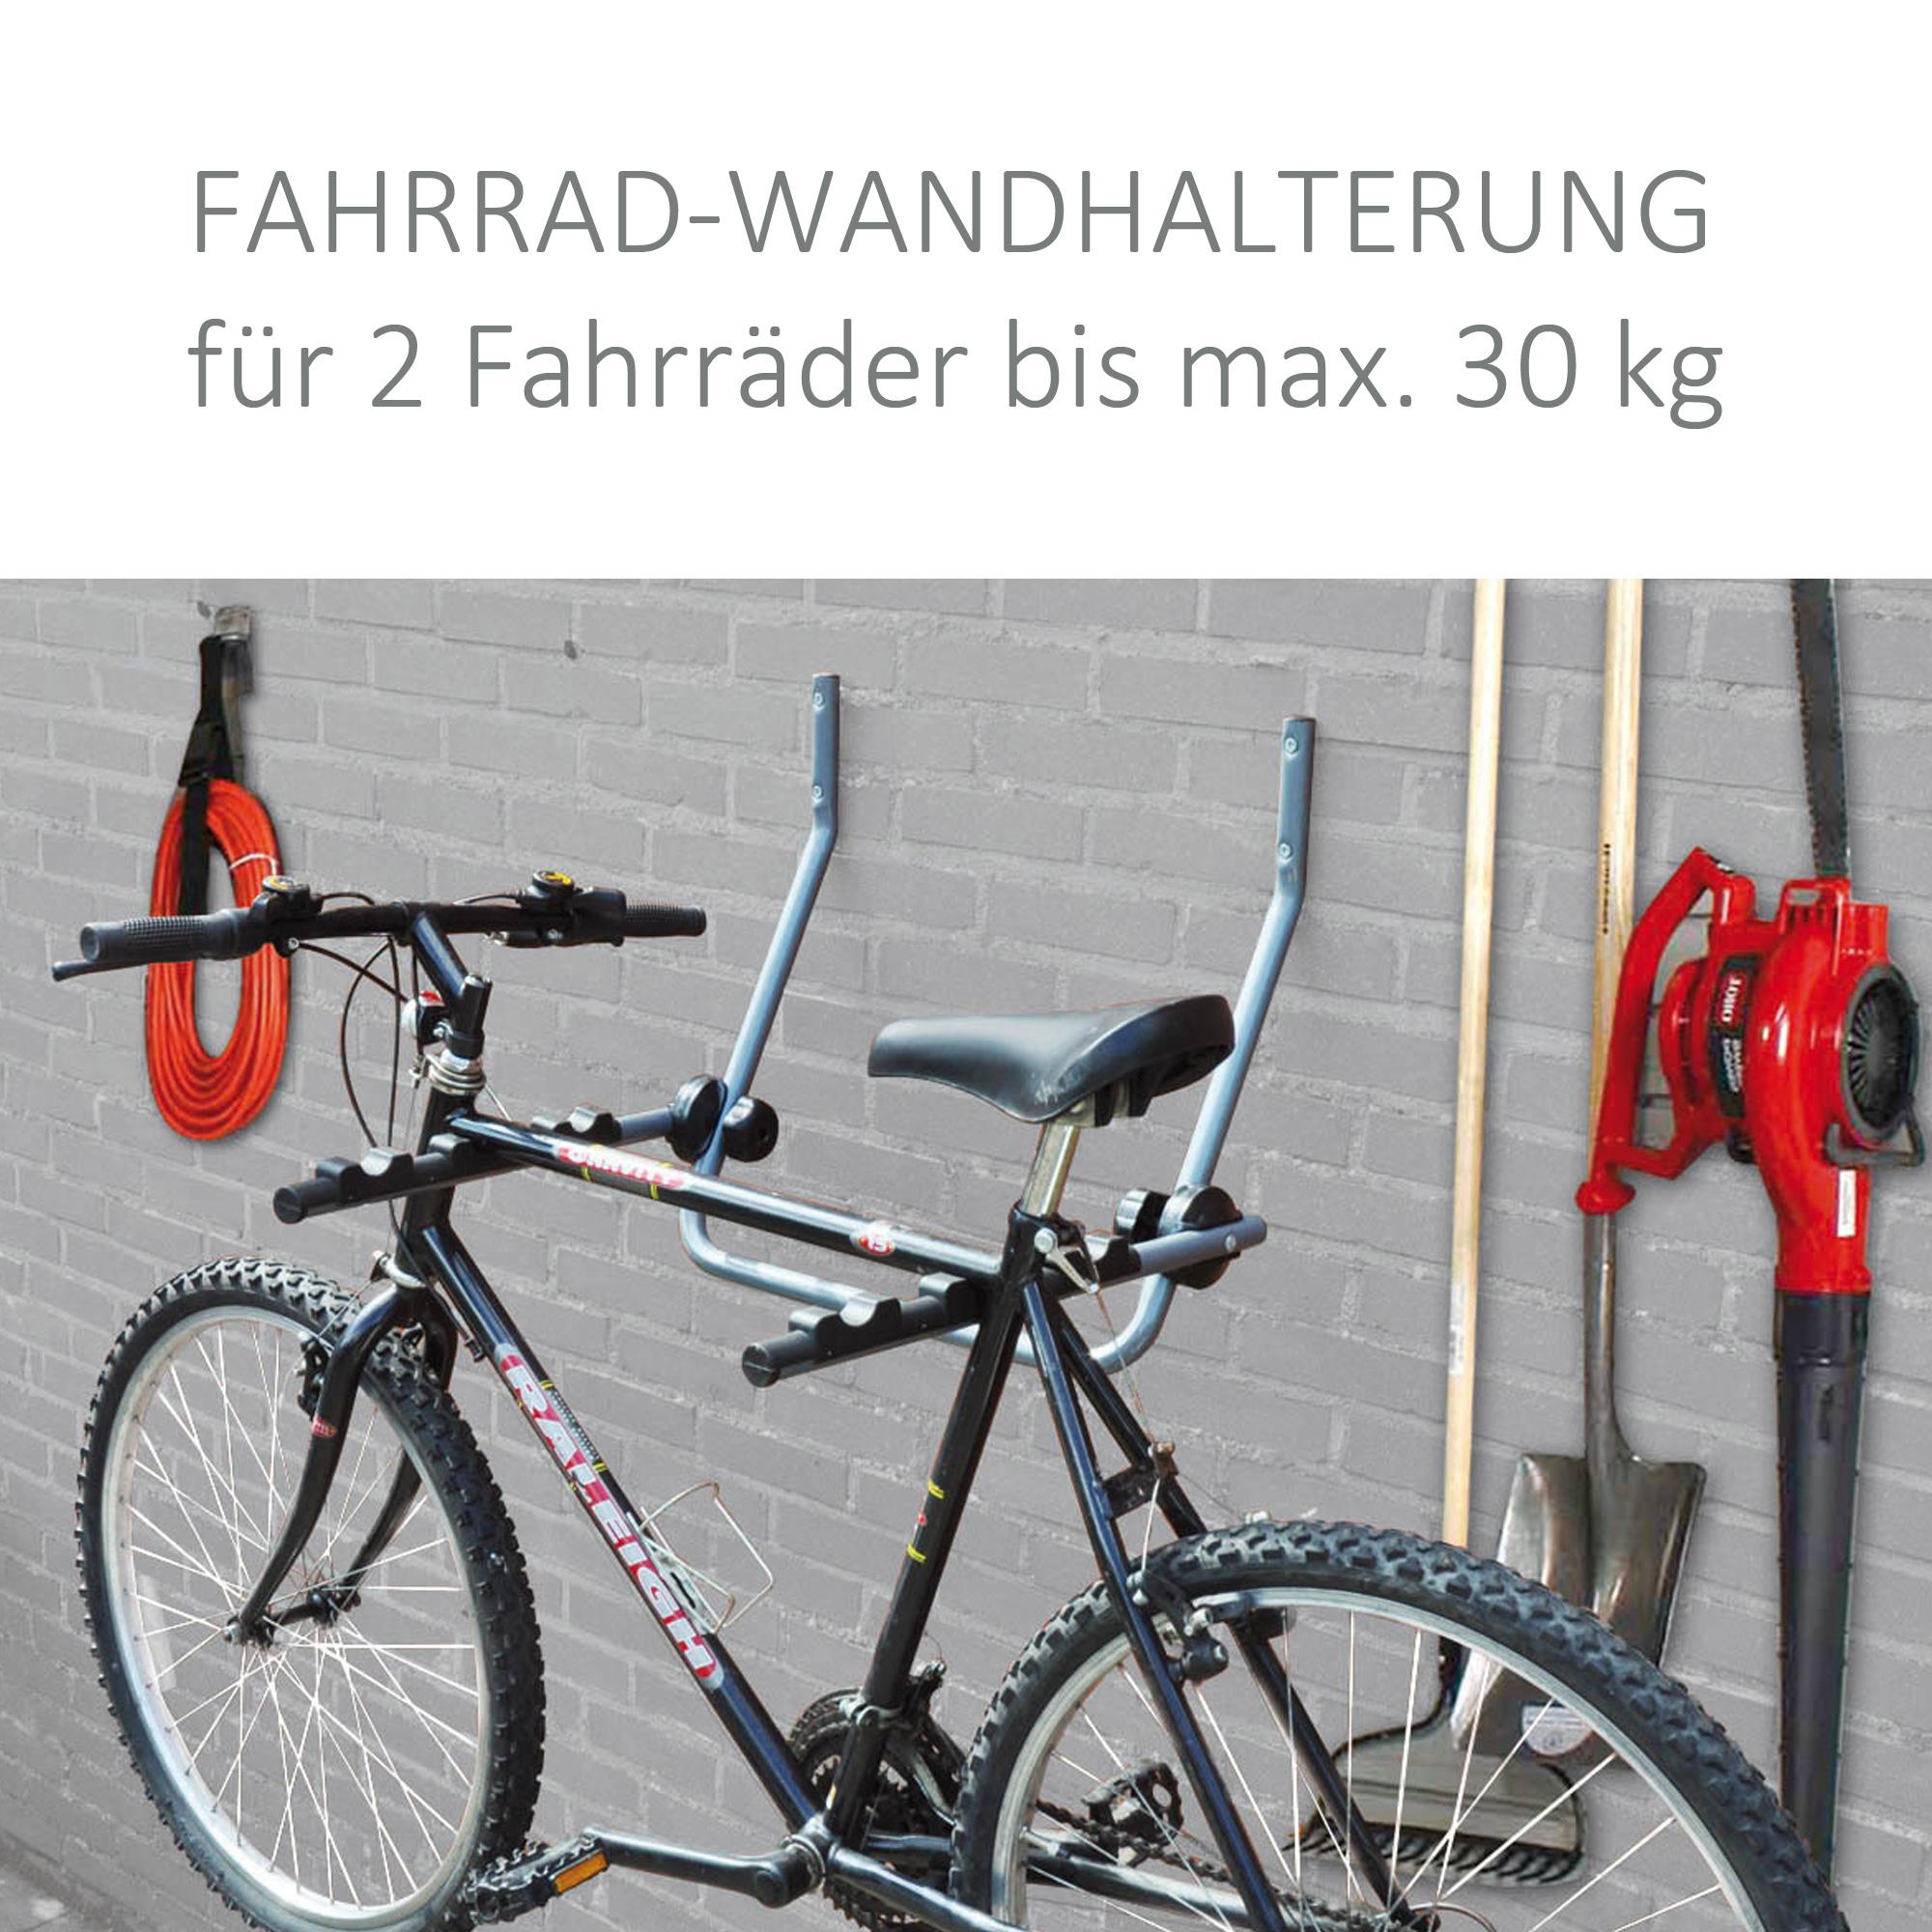 fahrradwandhalterung f r 2 fahrr der bis max 30 kg. Black Bedroom Furniture Sets. Home Design Ideas